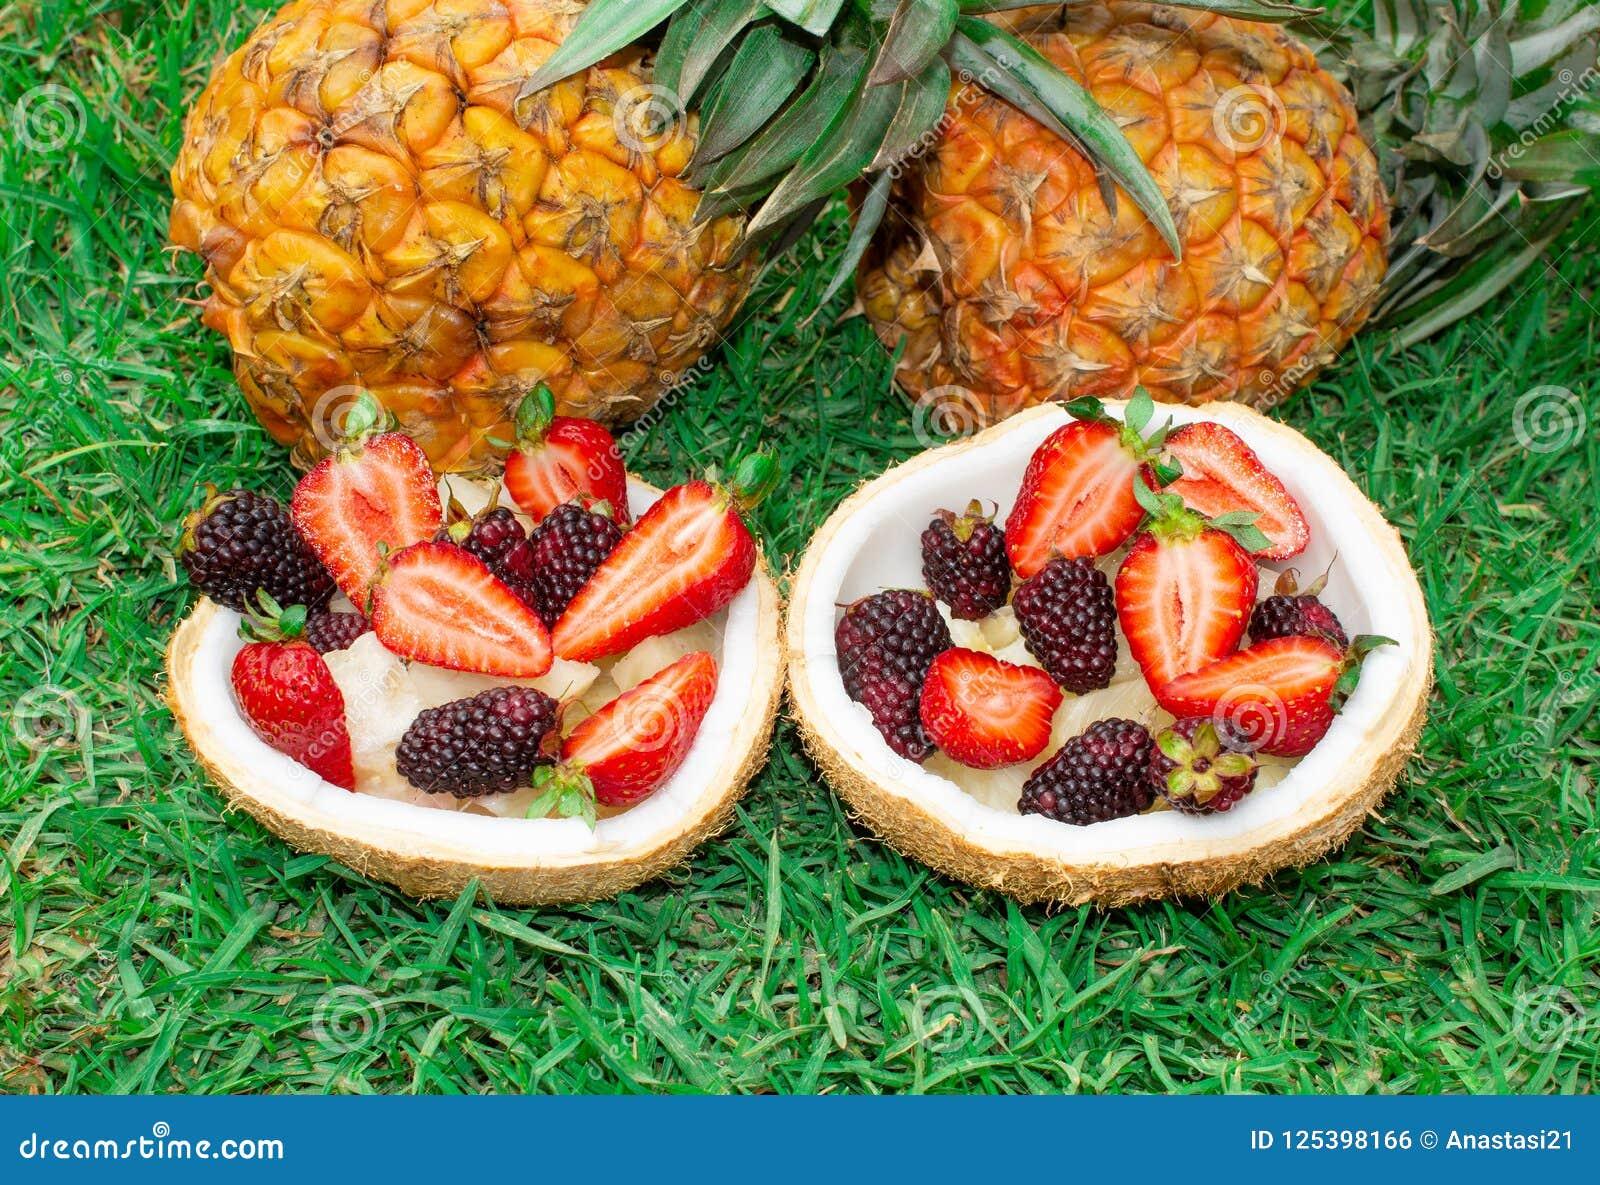 Fruit salad, berries, strawberries, blackberries, ananas in coconut. On the green grass. Still life.